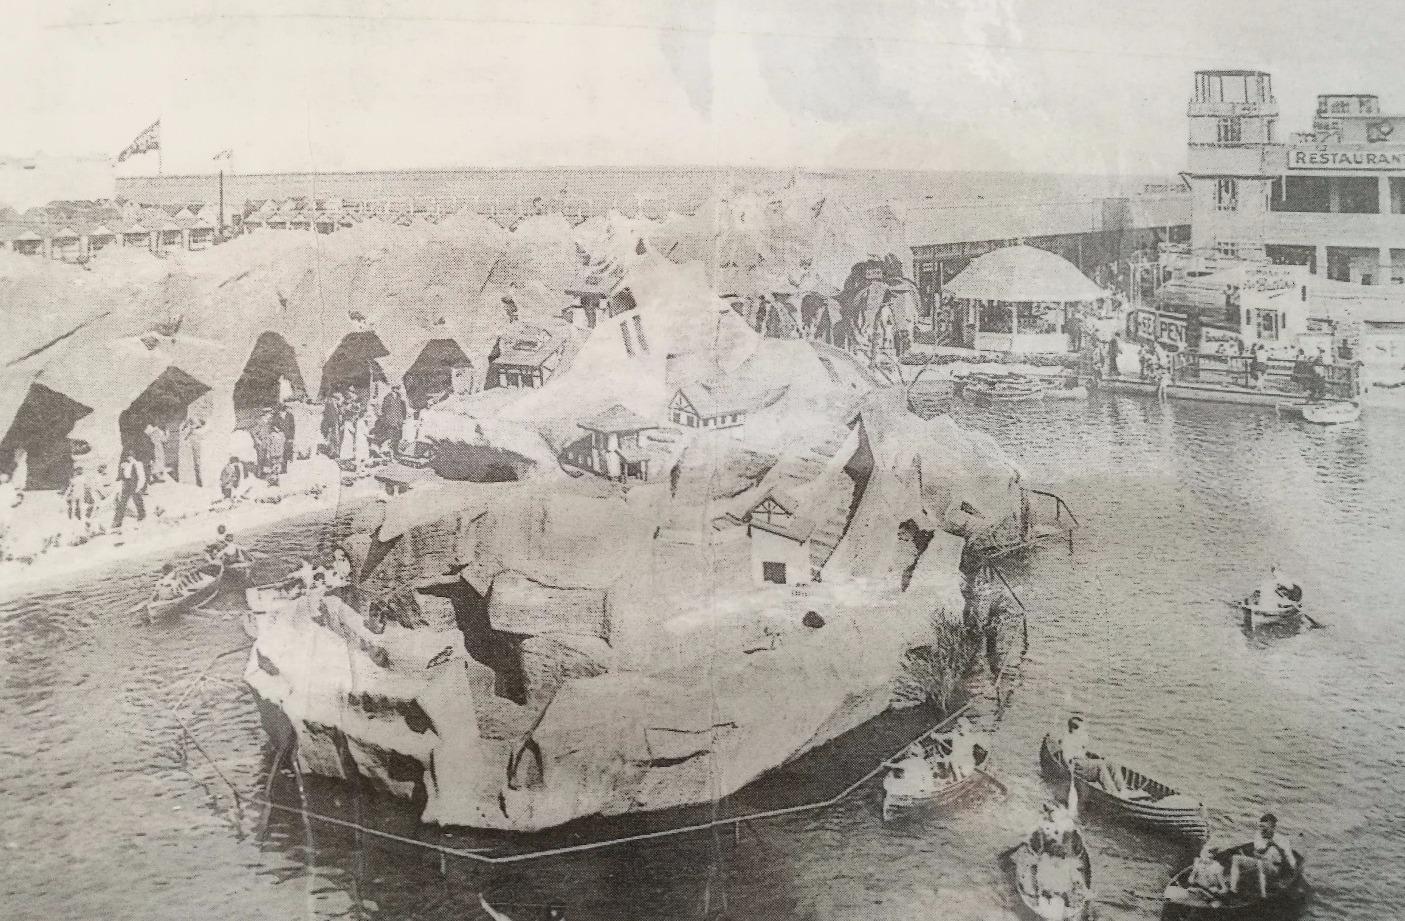 'Monkey Island', circa 1930's